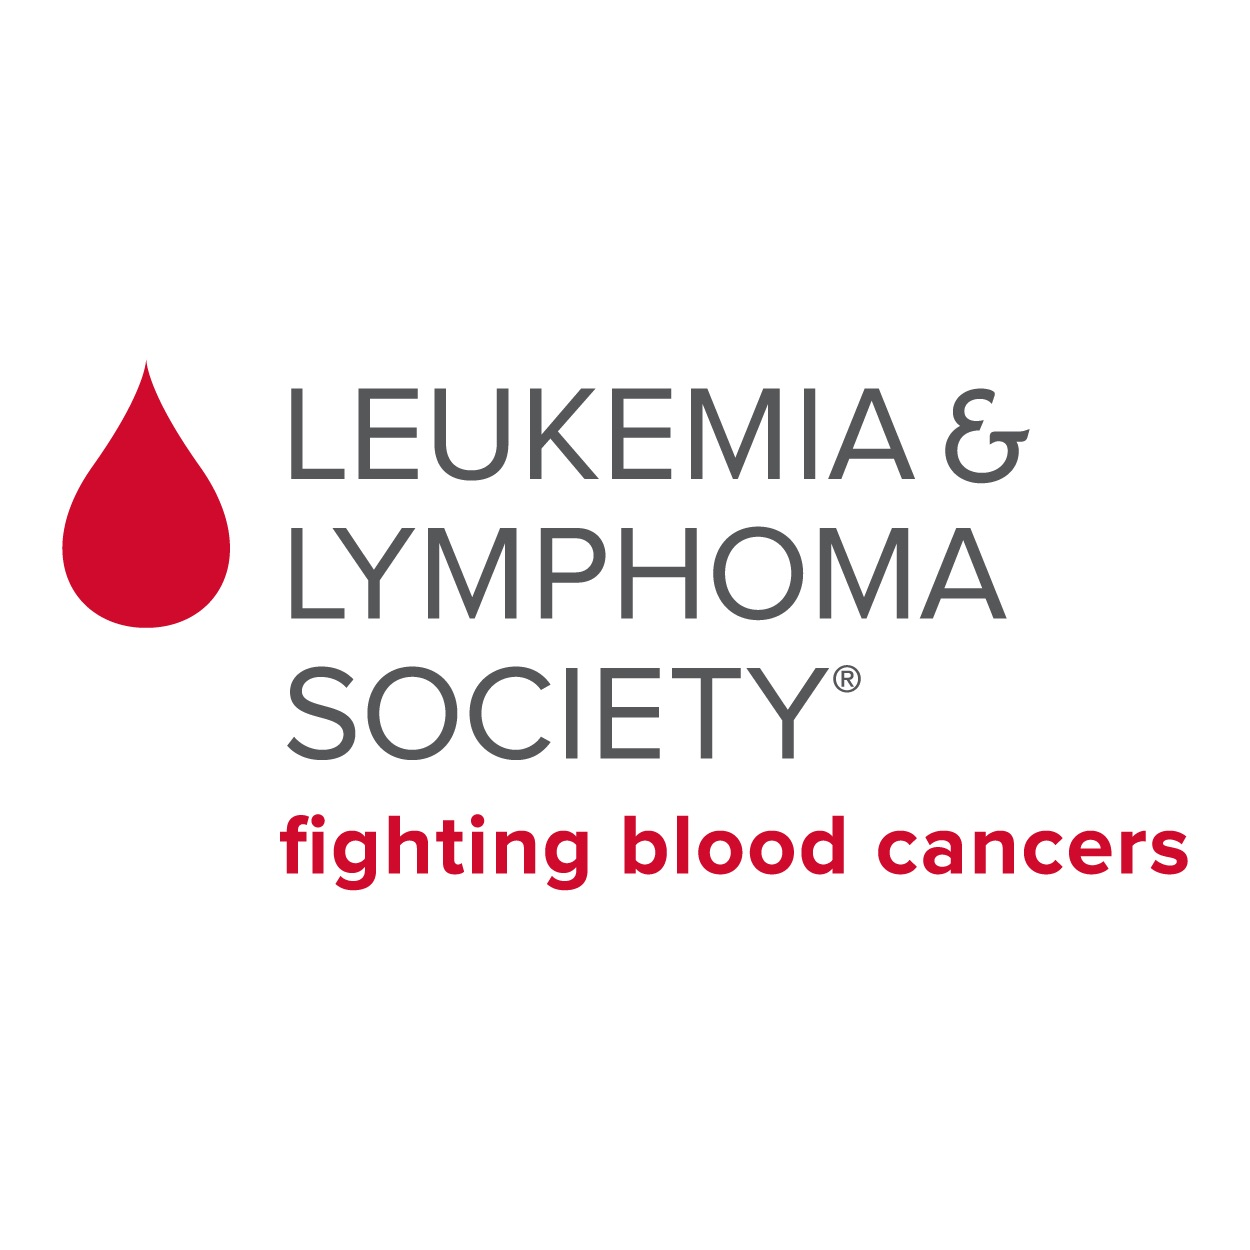 leukemia bone marrow transplantation hyper pigmentation